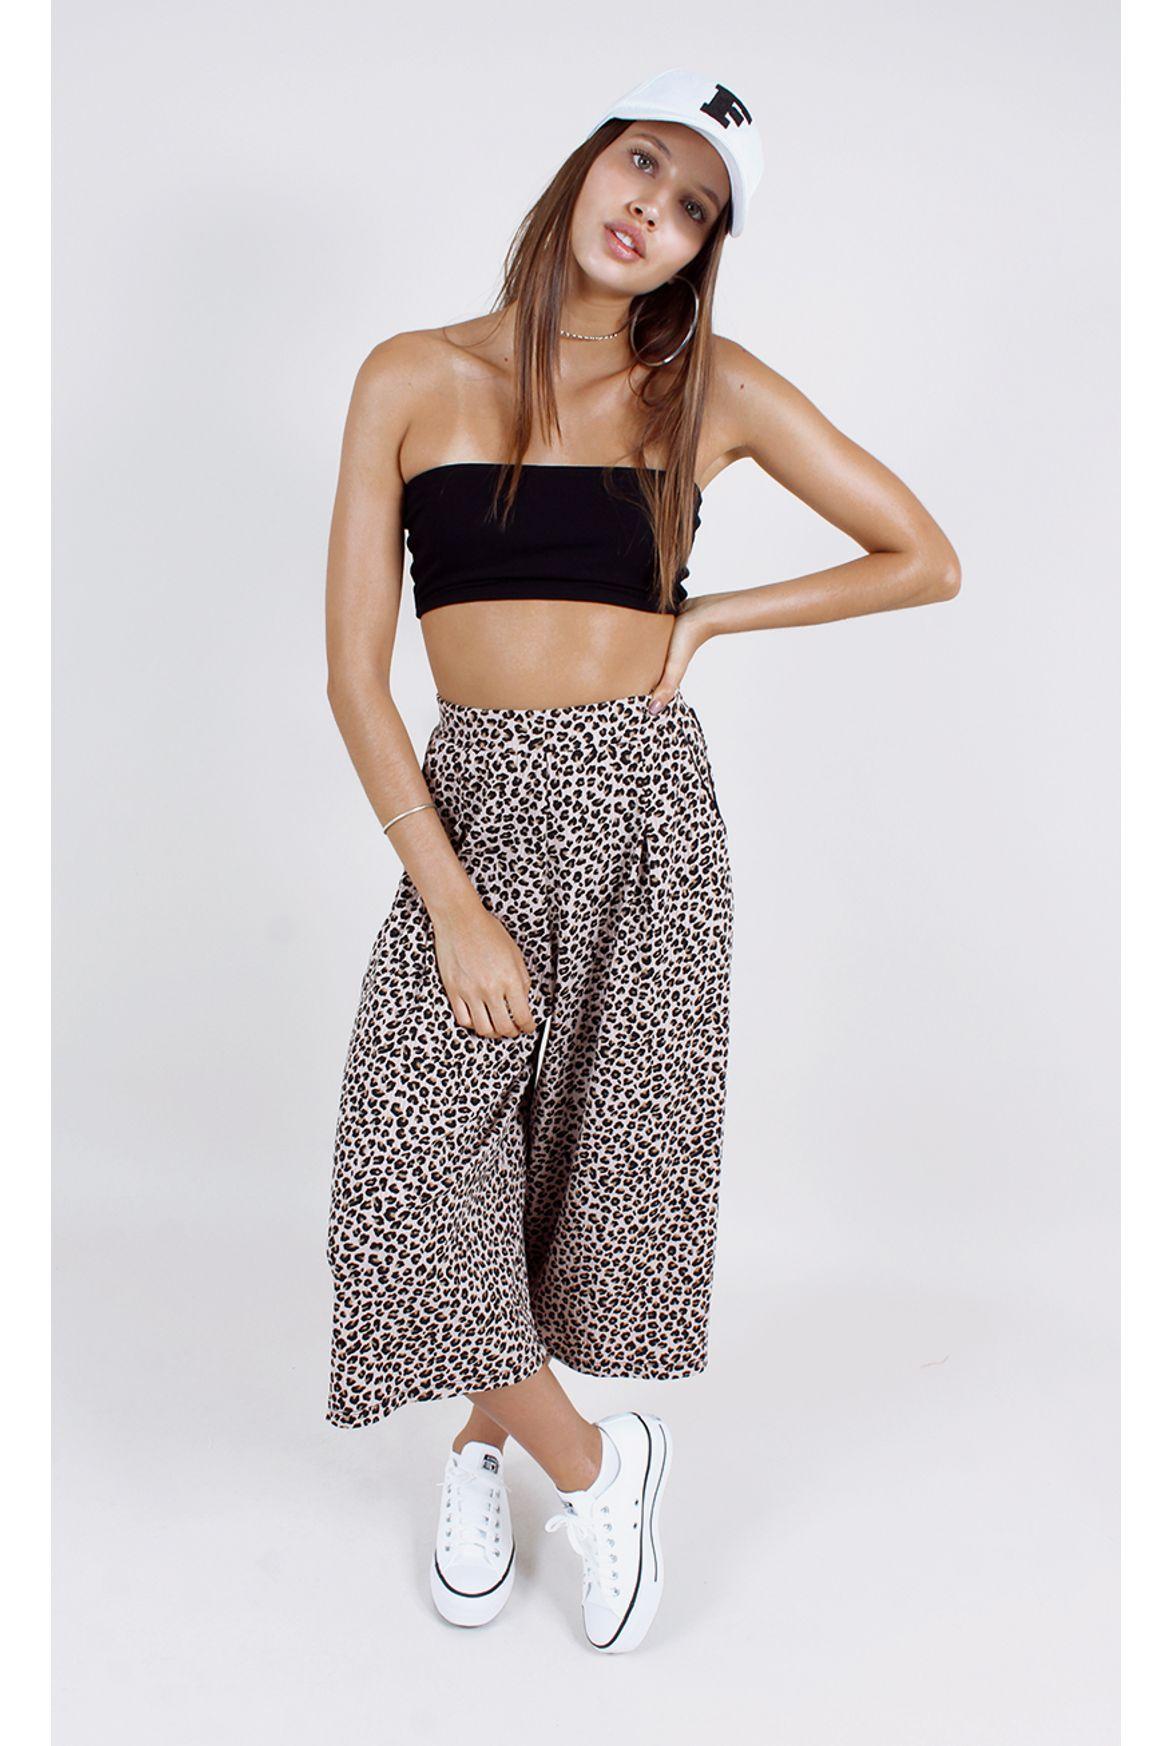 208bd4954 calça leopard pantacourt estampa - Fashion Closet